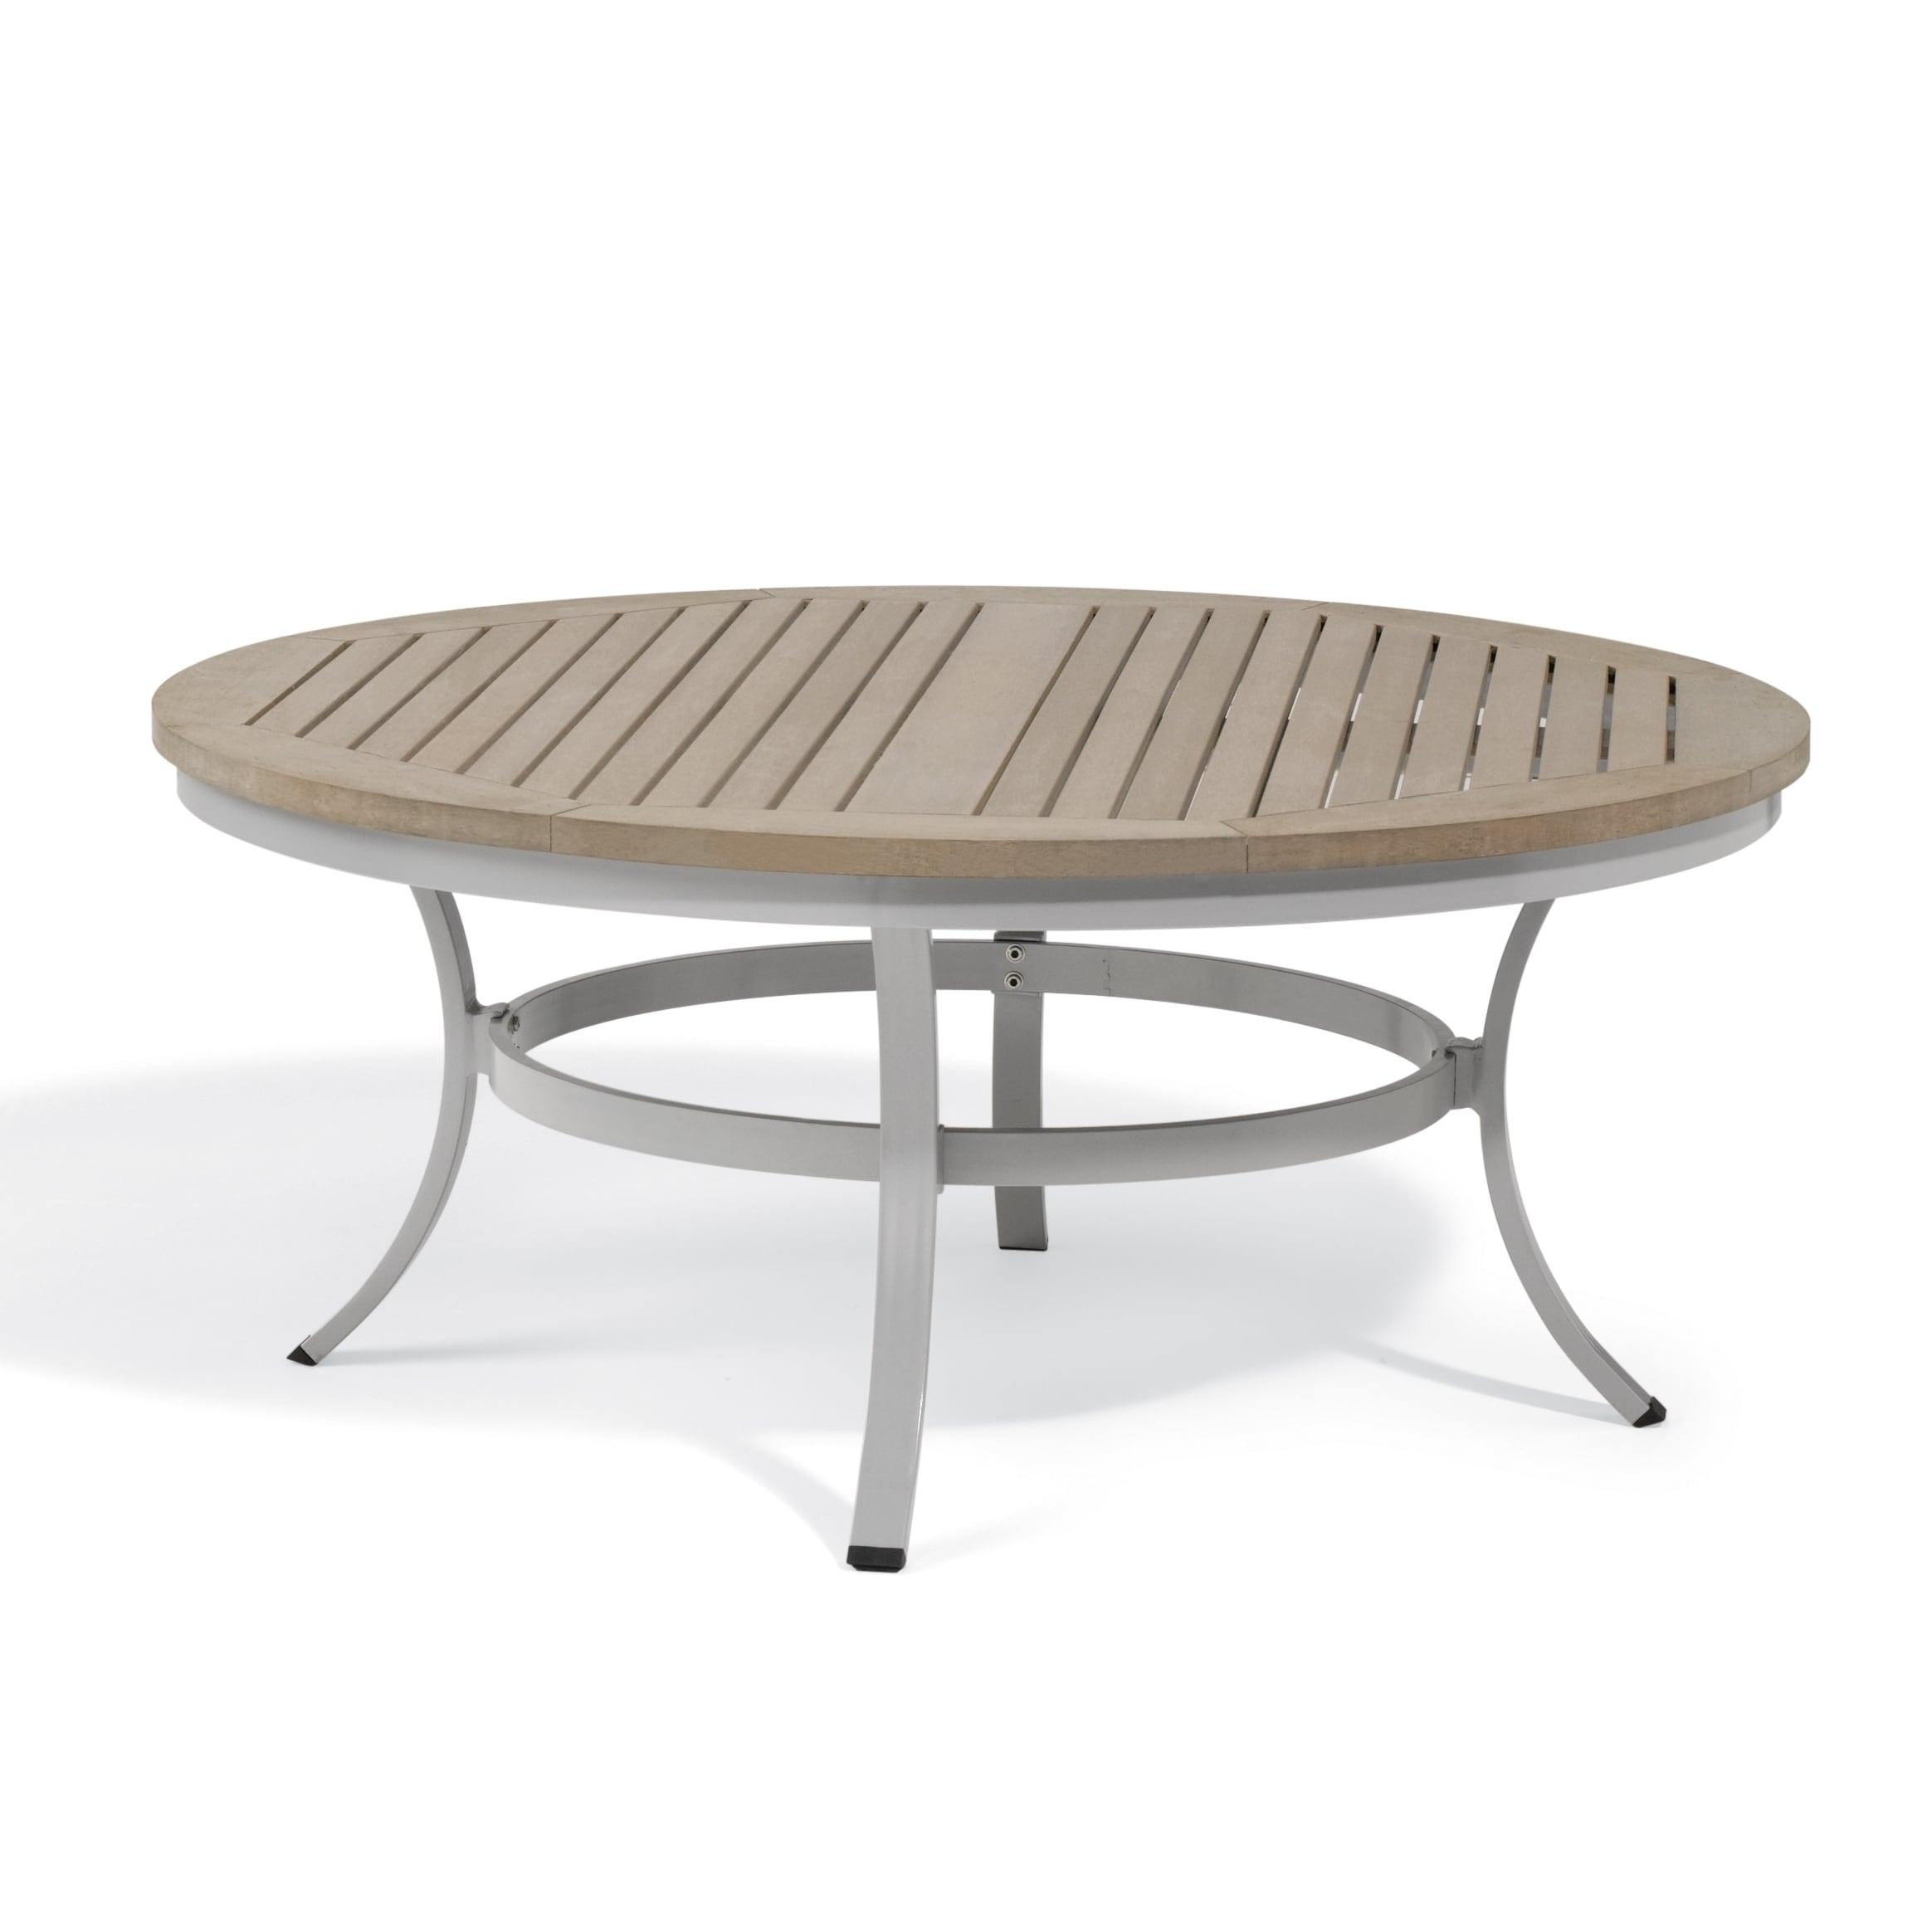 Oxford Garden Travira 48 inch Round Chat Table (Aluminum,...